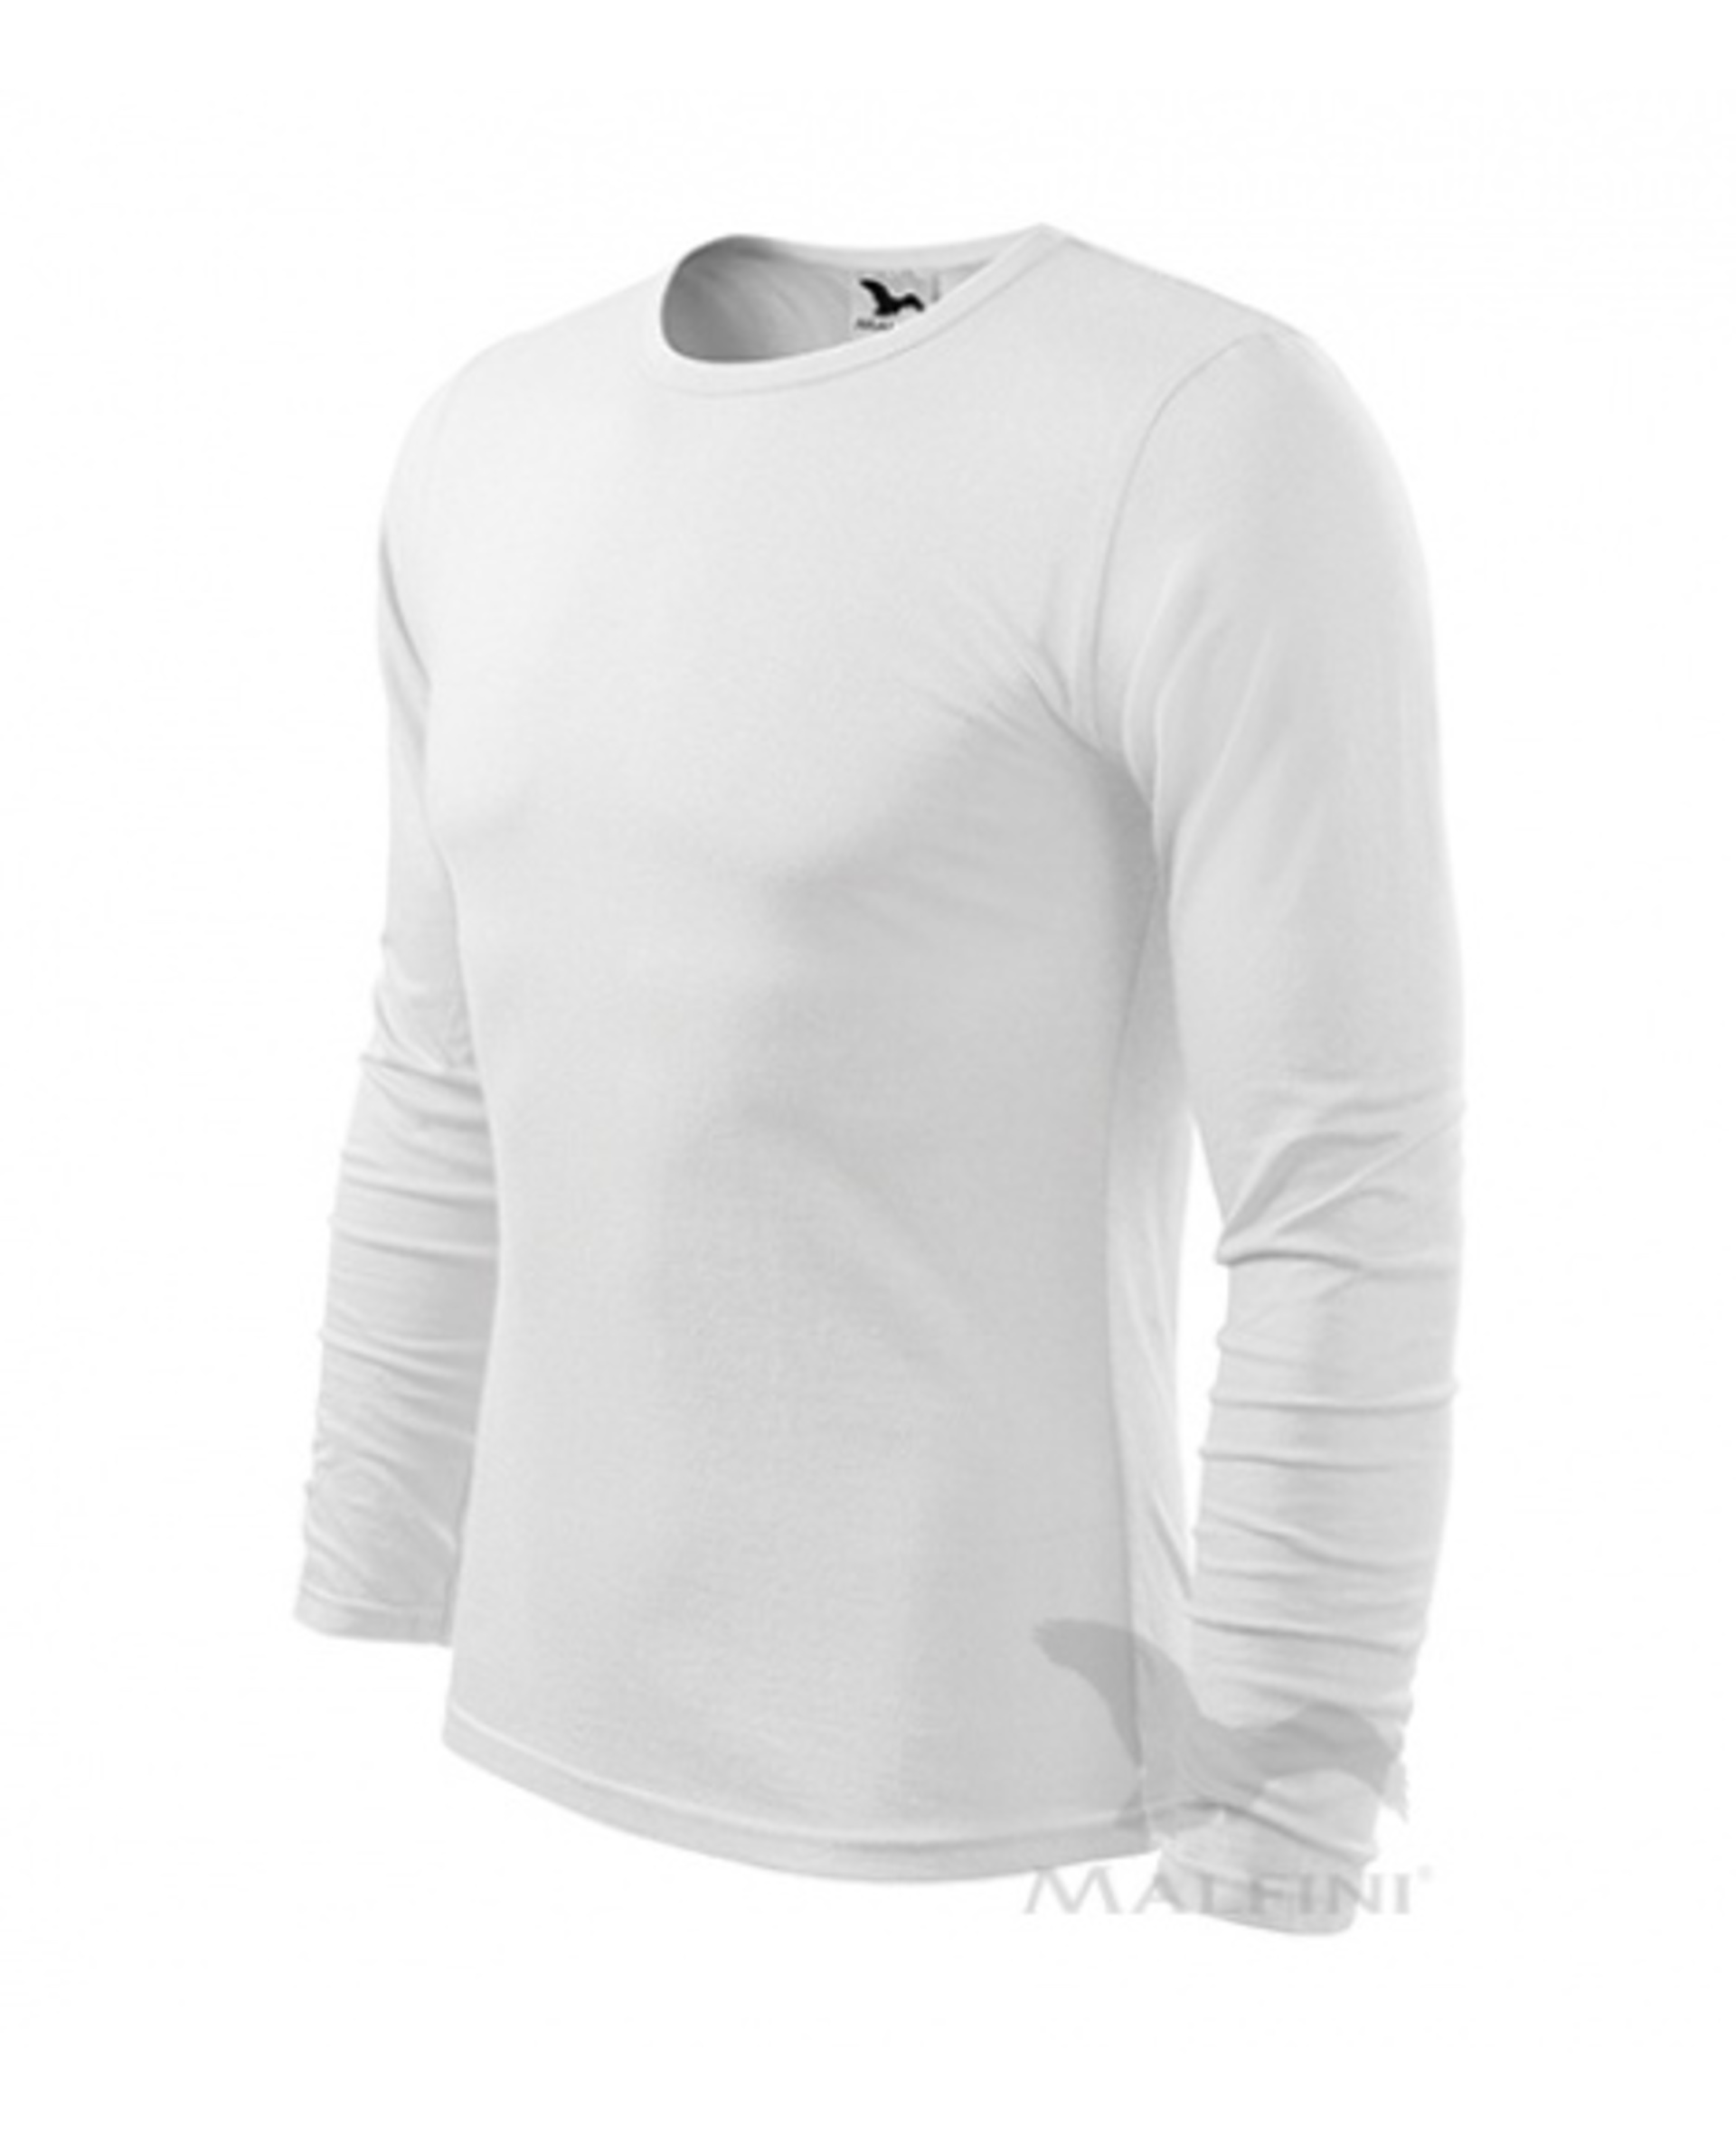 ADLER FIT-T LONG SLEEVE pánské dlouhý rukáv Tričko bílá 3XL